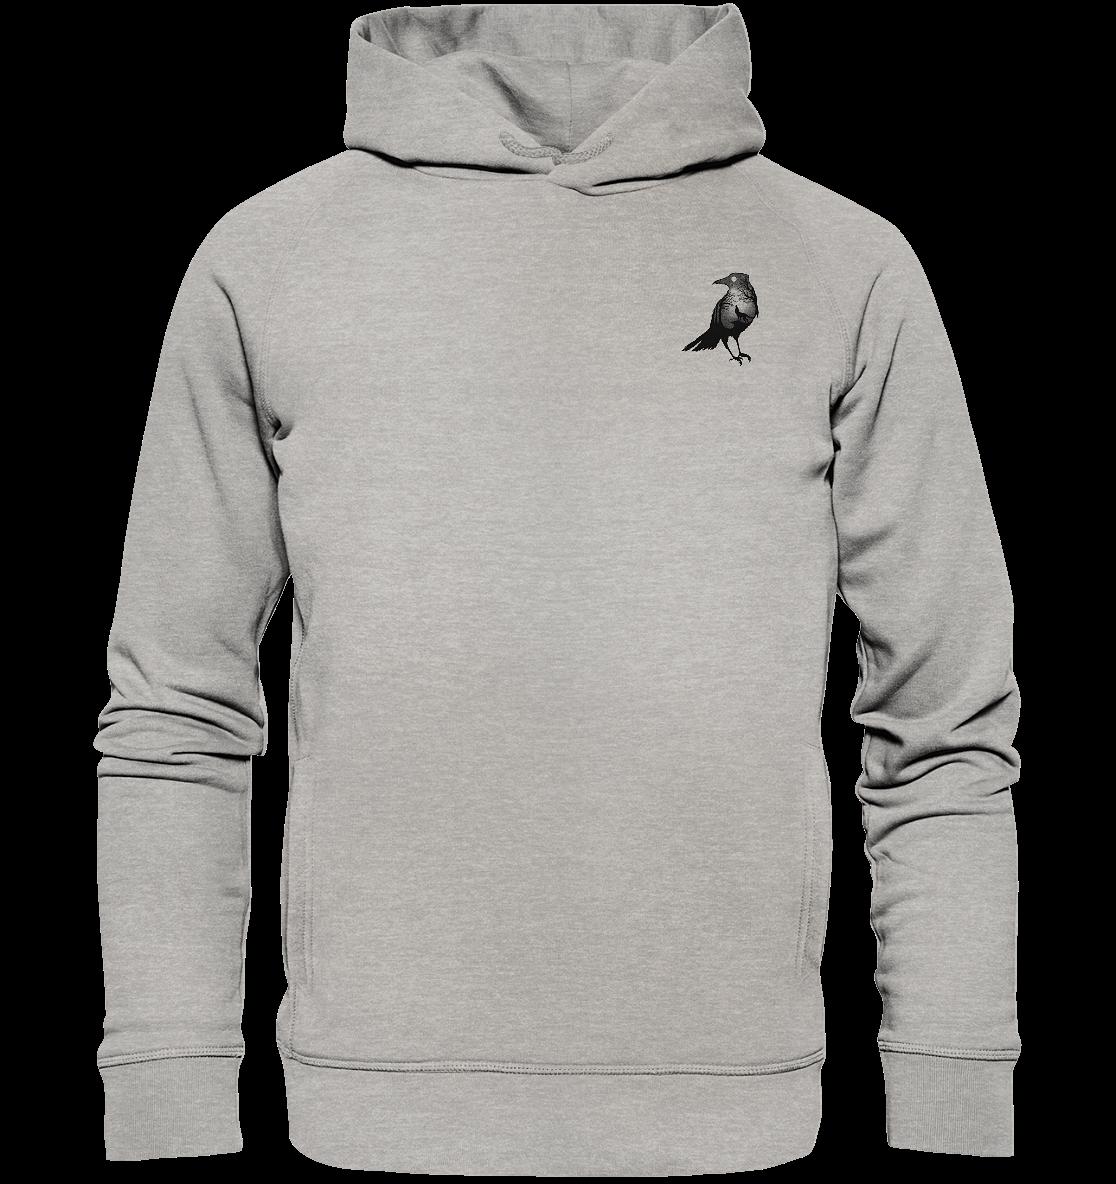 front-organic-fashion-hoodie-c2c1c0-1116x-2.png